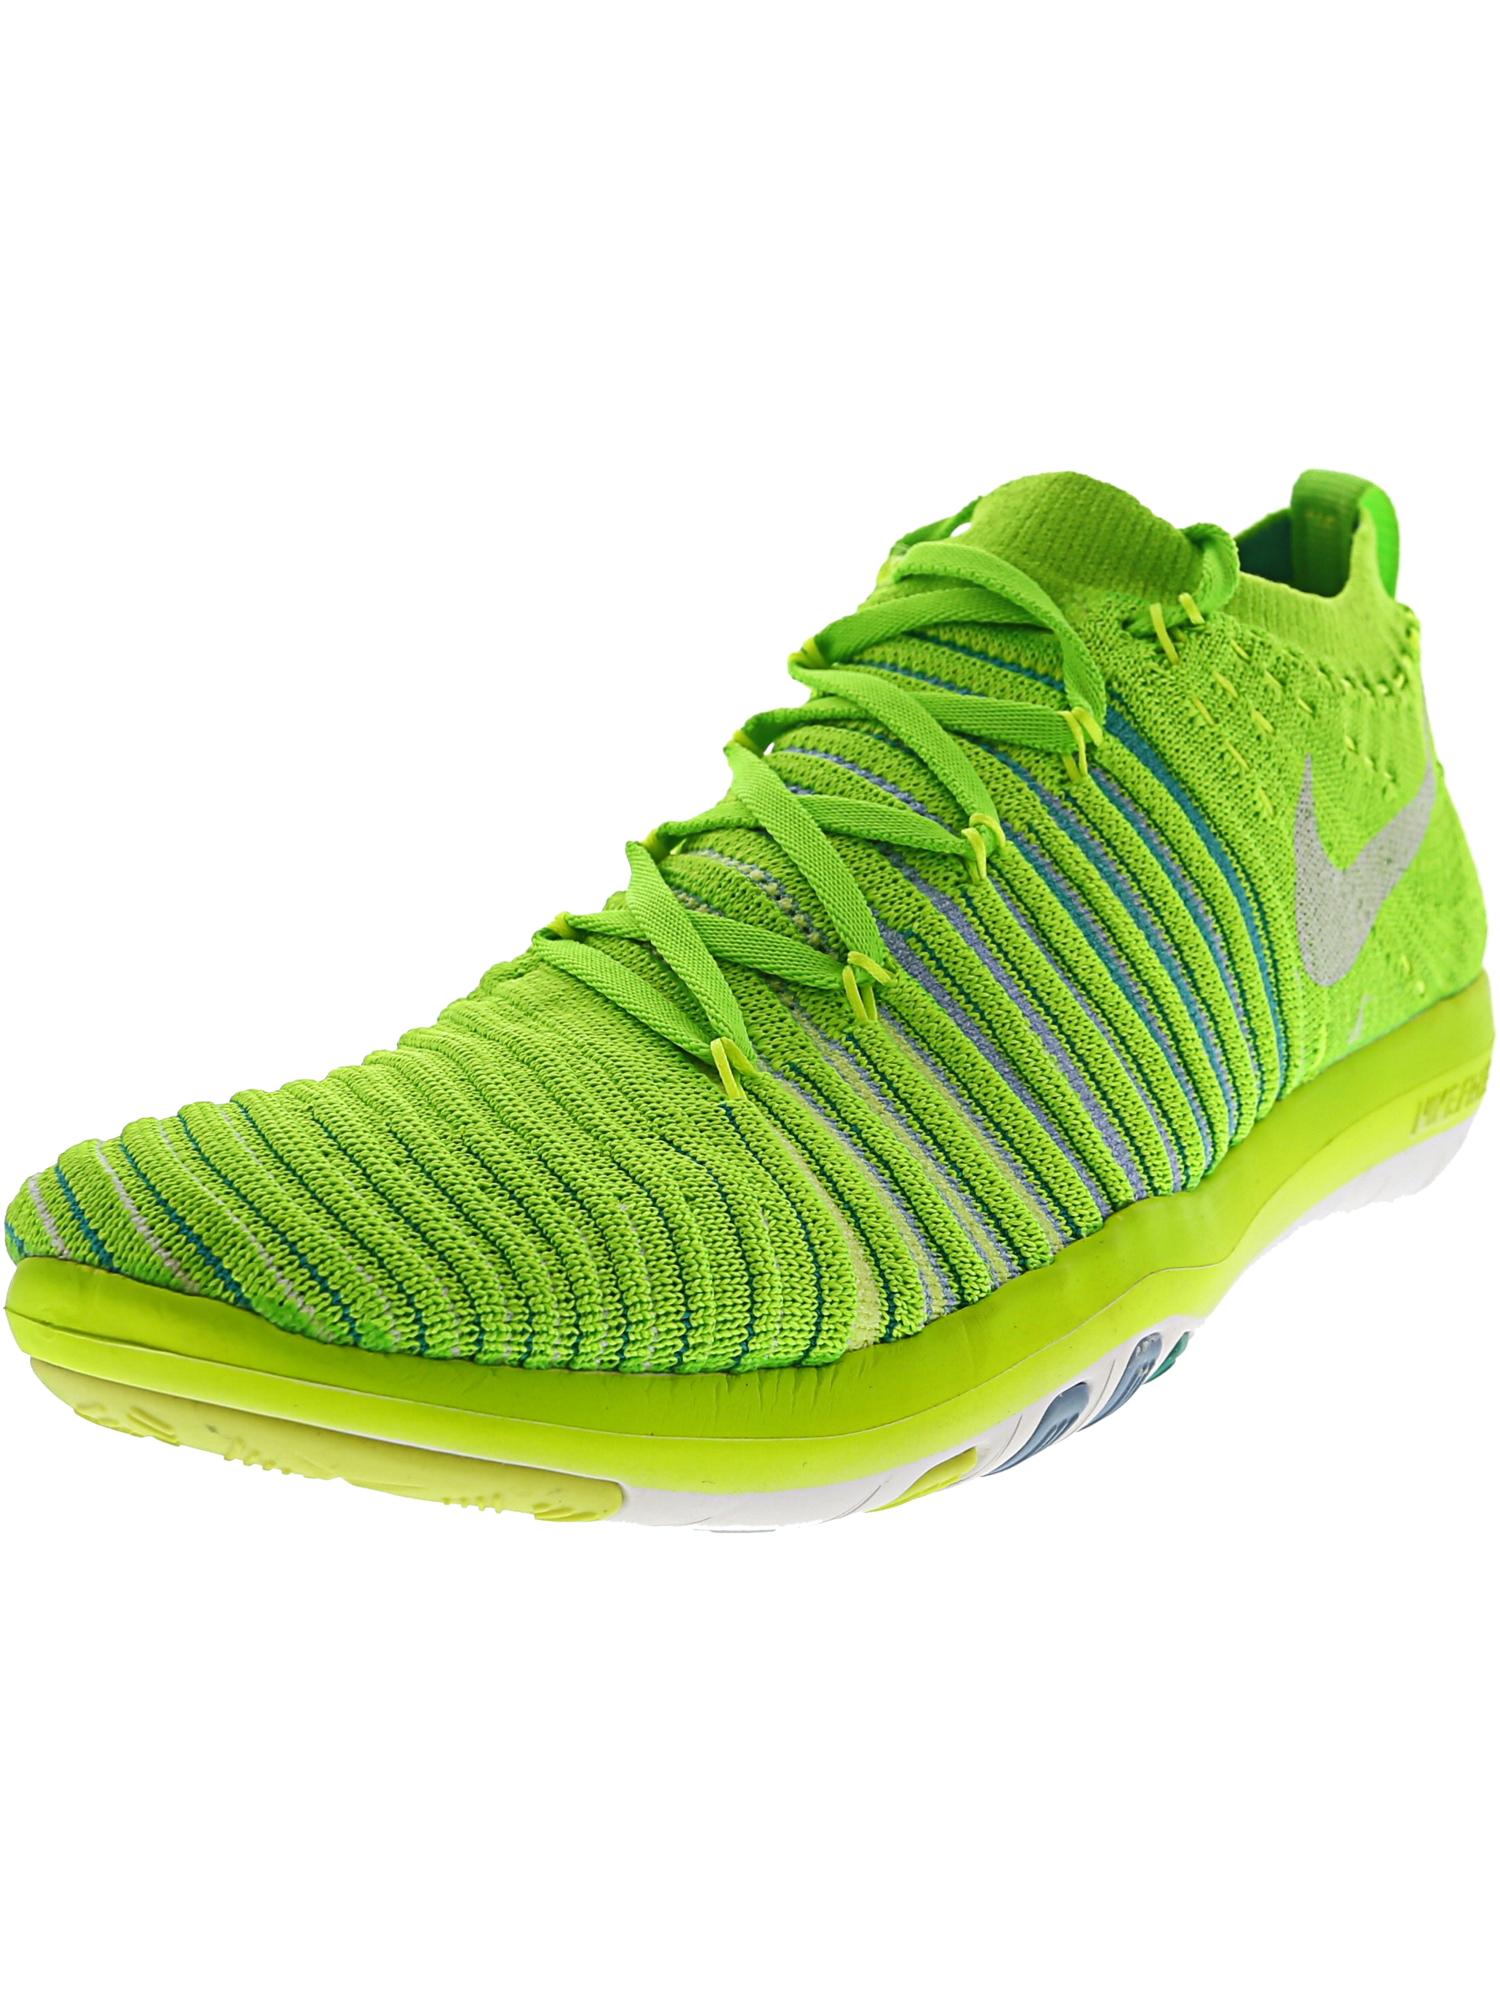 Nike Women's Freetransform Freetransform Freetransform Flyknit Ankle-High Fabric Training shoes 6f00c4